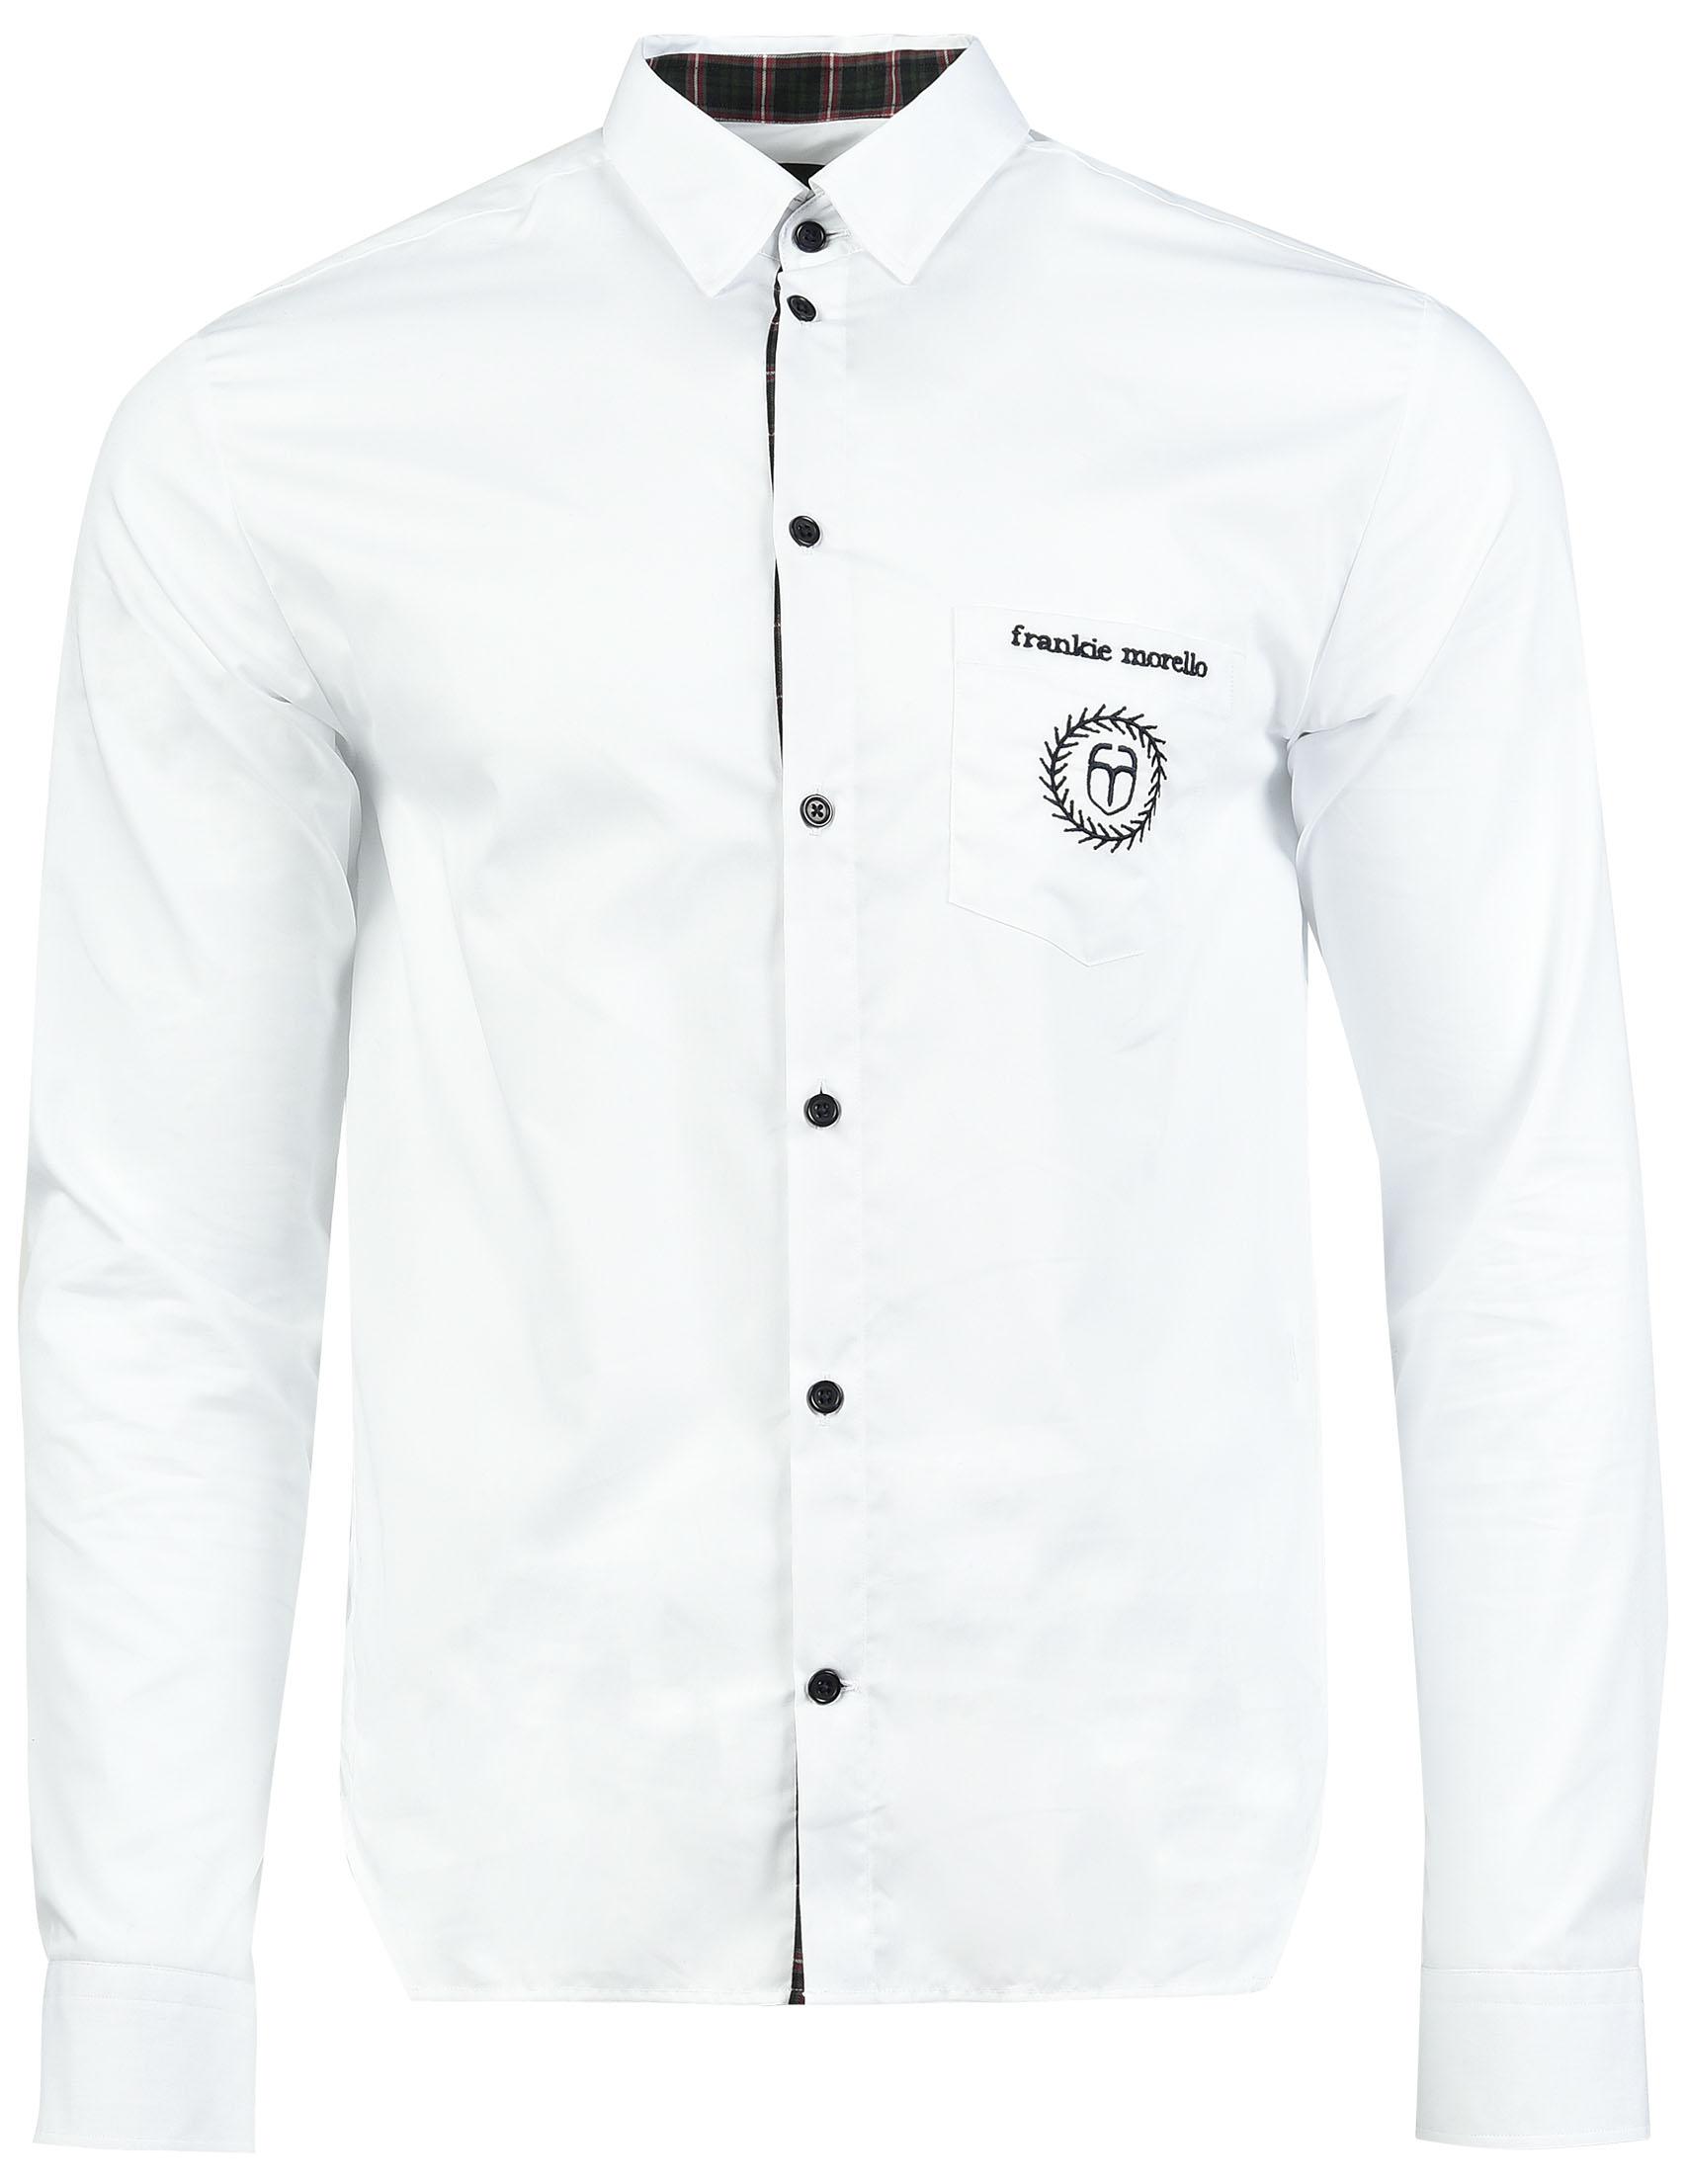 Купить Рубашка, FRANKIE MORELLO, Белый, 100%Хлопок, Осень-Зима